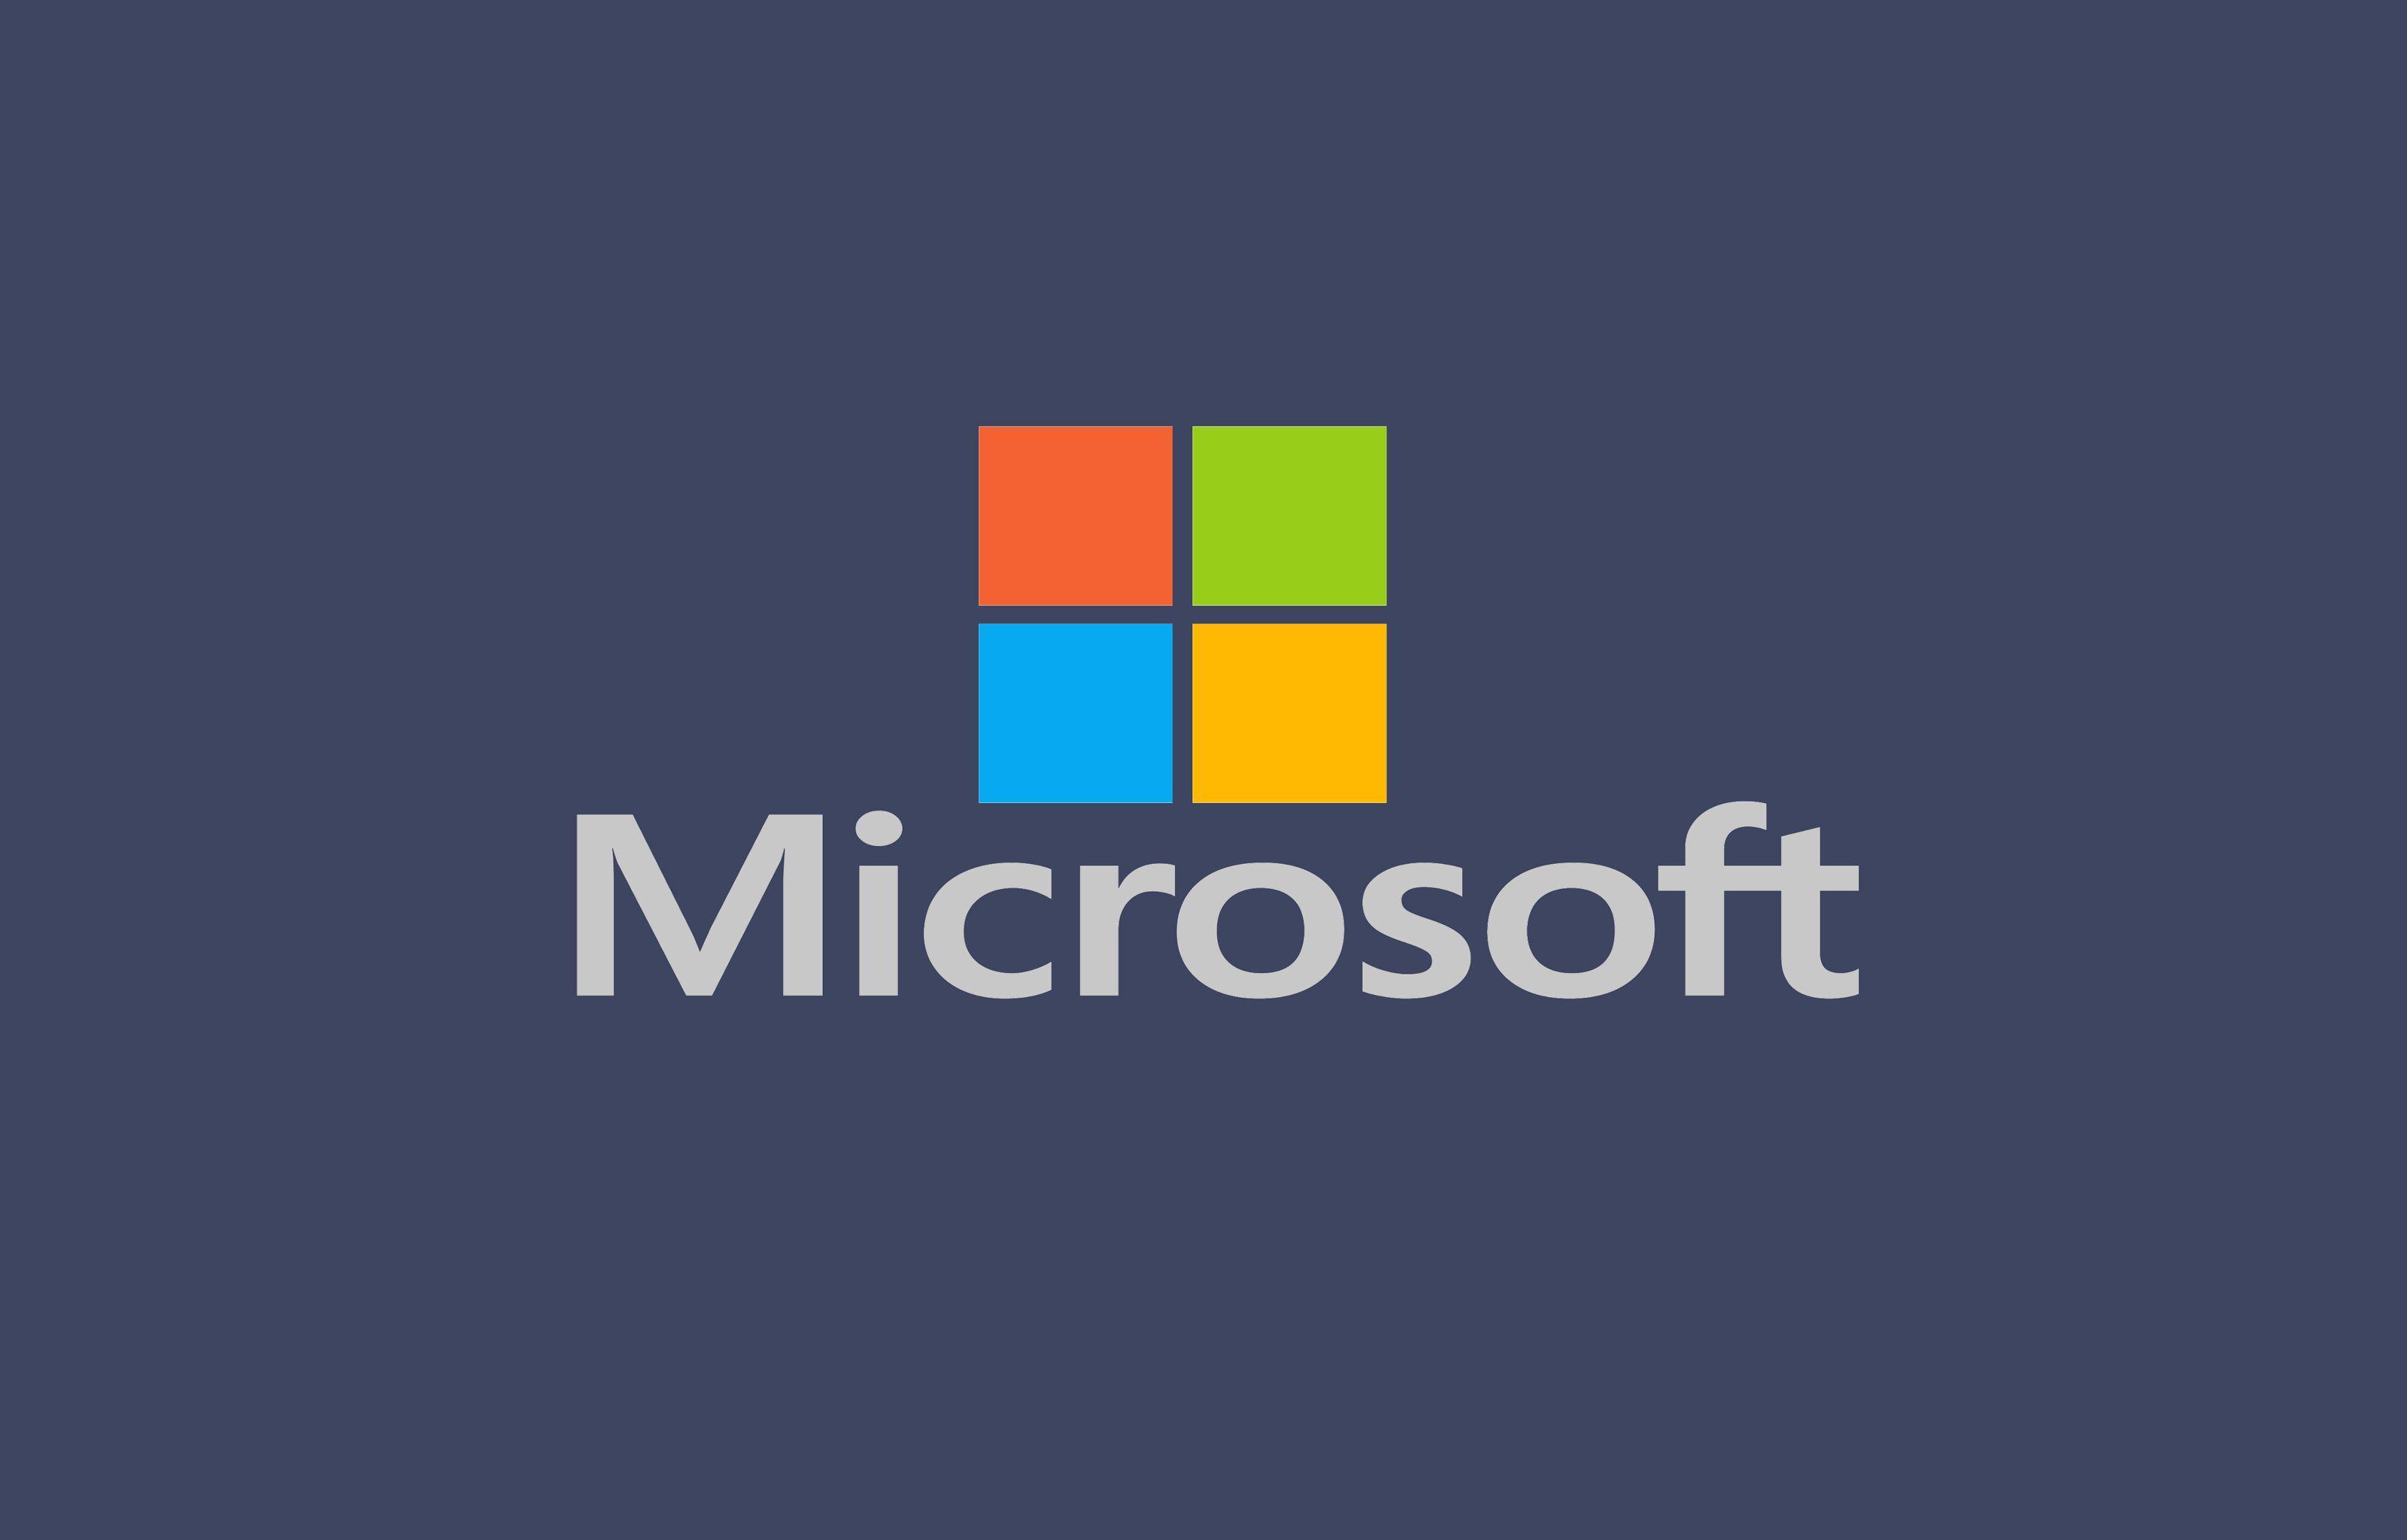 Microsoft Hd Wallpapers Top Free Microsoft Hd Backgrounds Wallpaperaccess